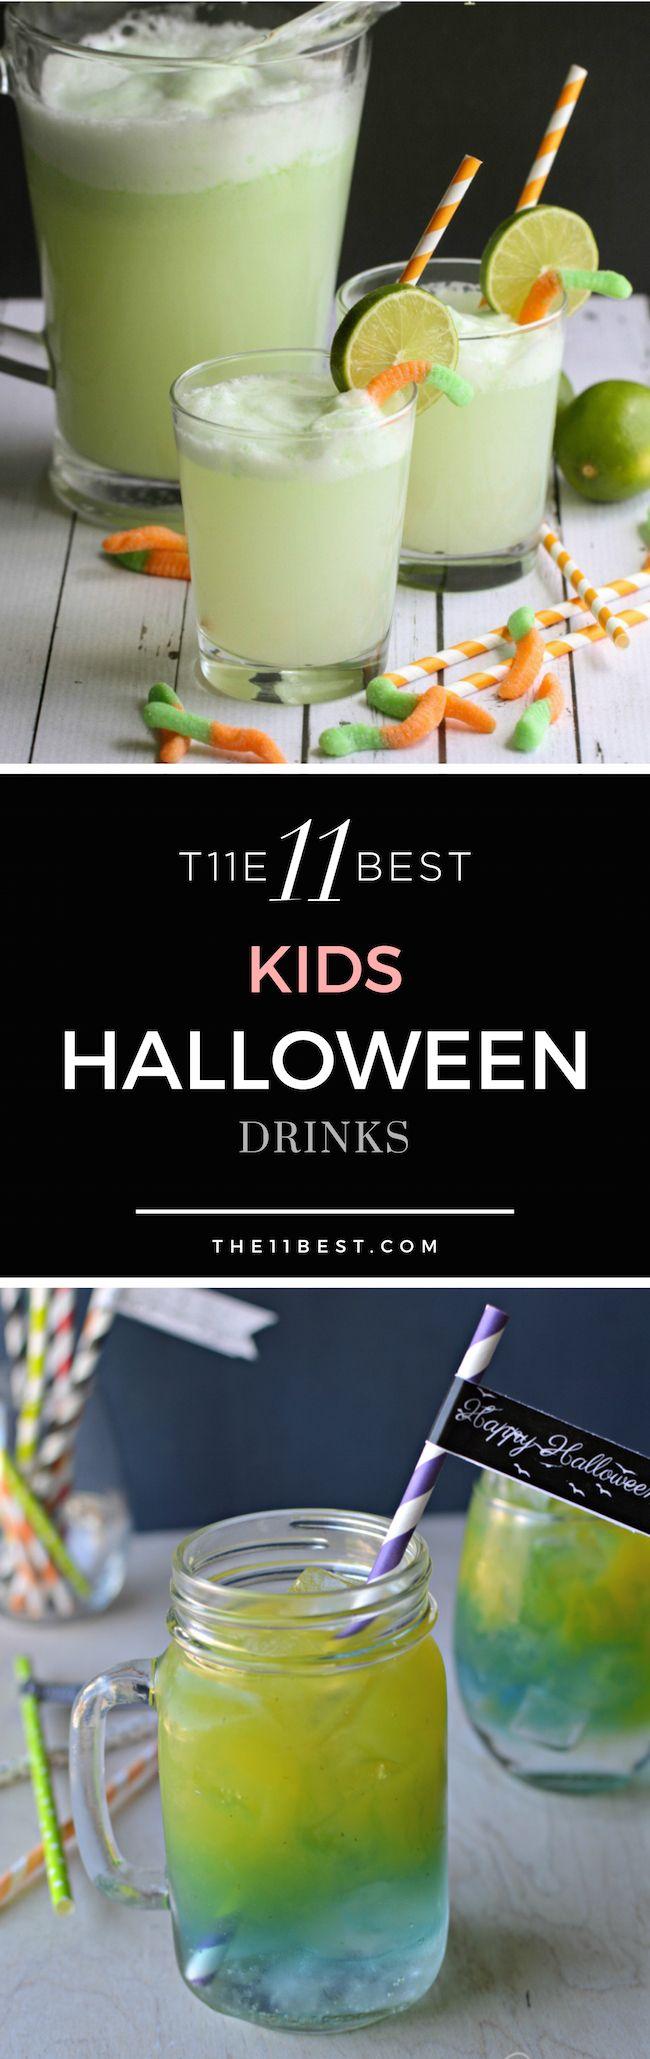 The 11 Best Halloween Drink Recipes For Kids Halloween Pinterest